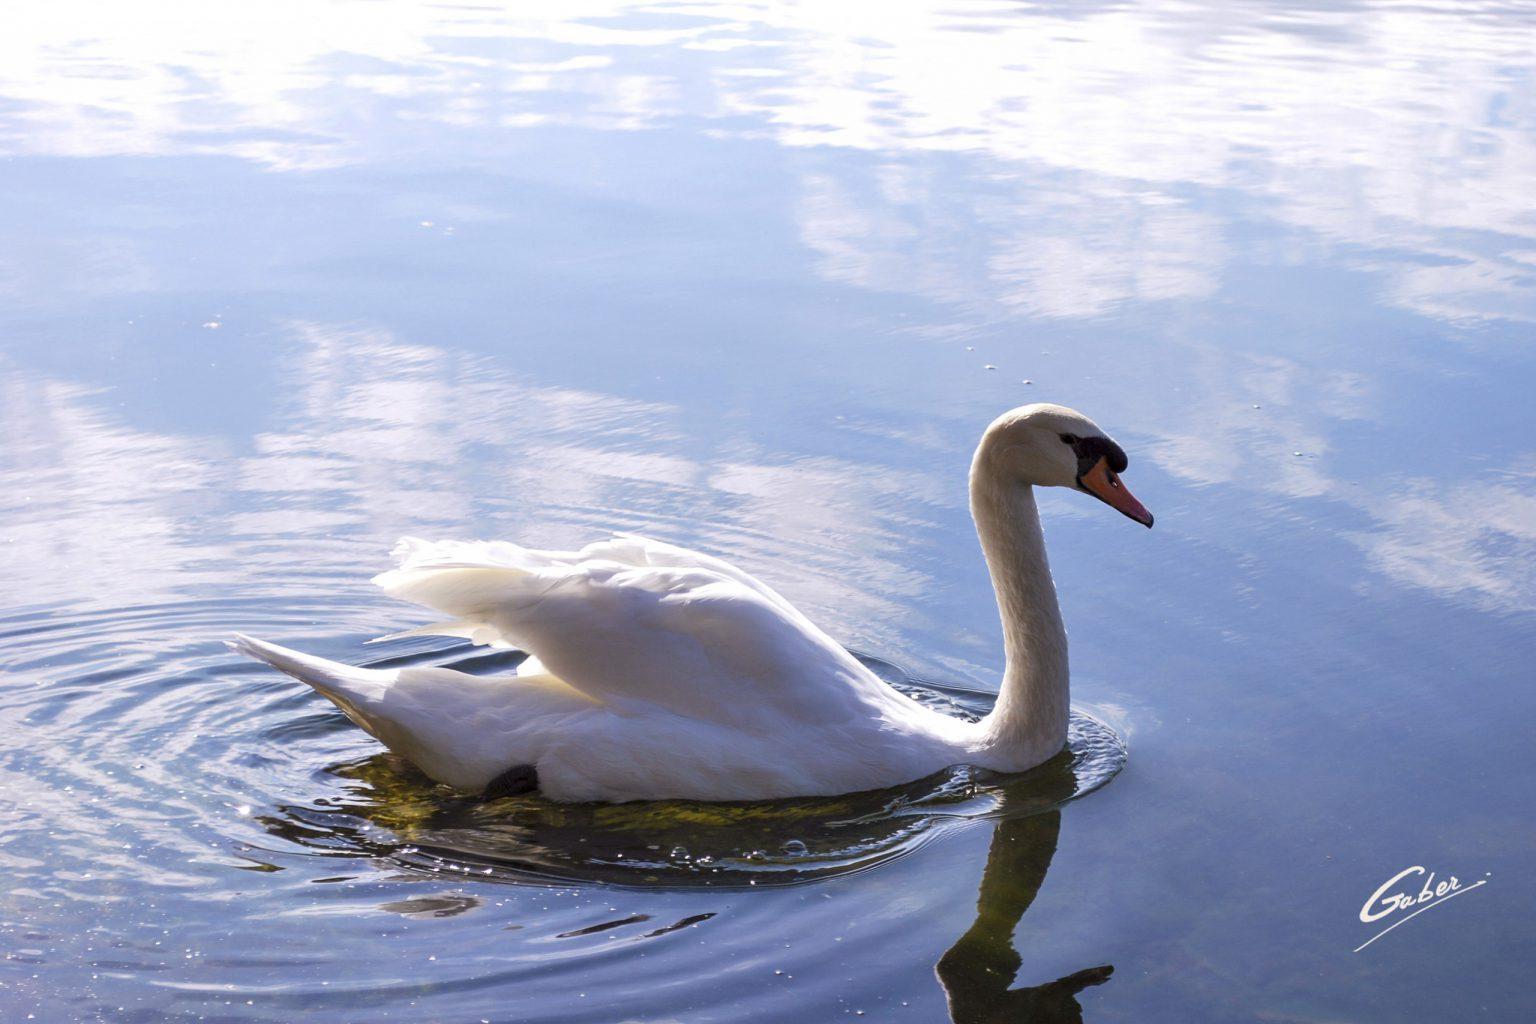 Swan_45_FINAL_GAB-C-BISW-09